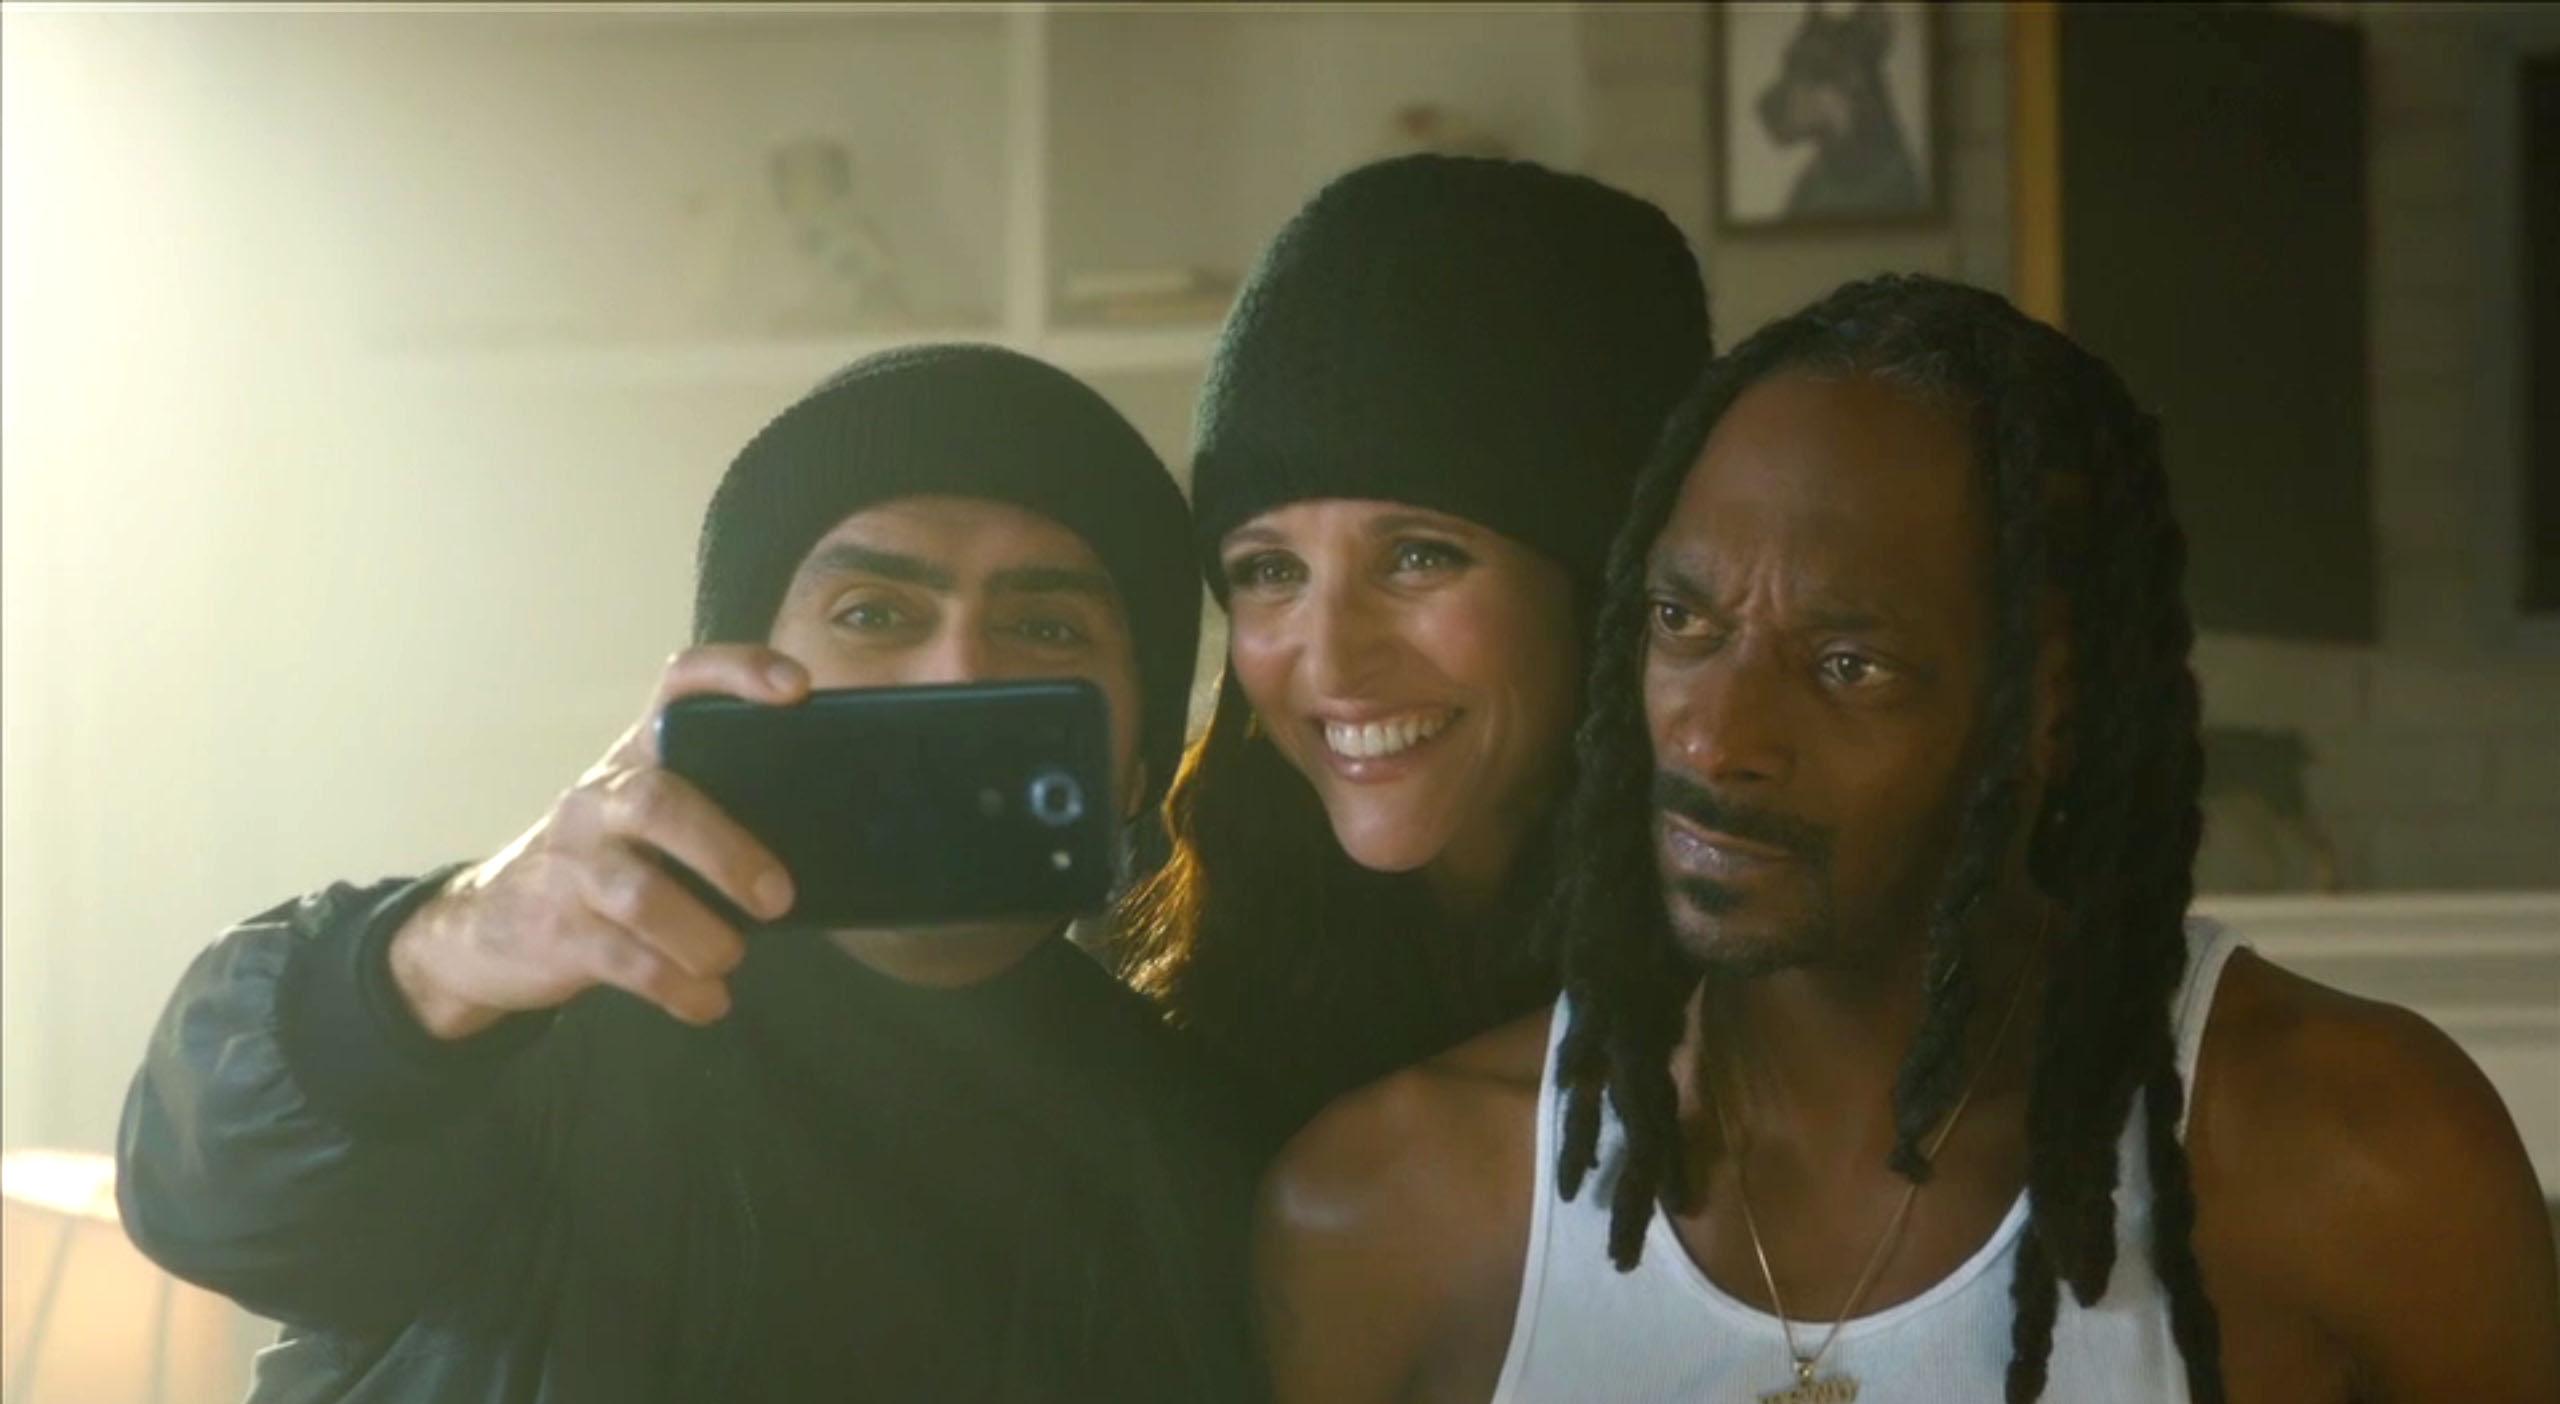 Old Navy | Black Friday 2015 (Julia Louis-Dreyfus, Kumail Nanjiani, & Snoop Dogg)